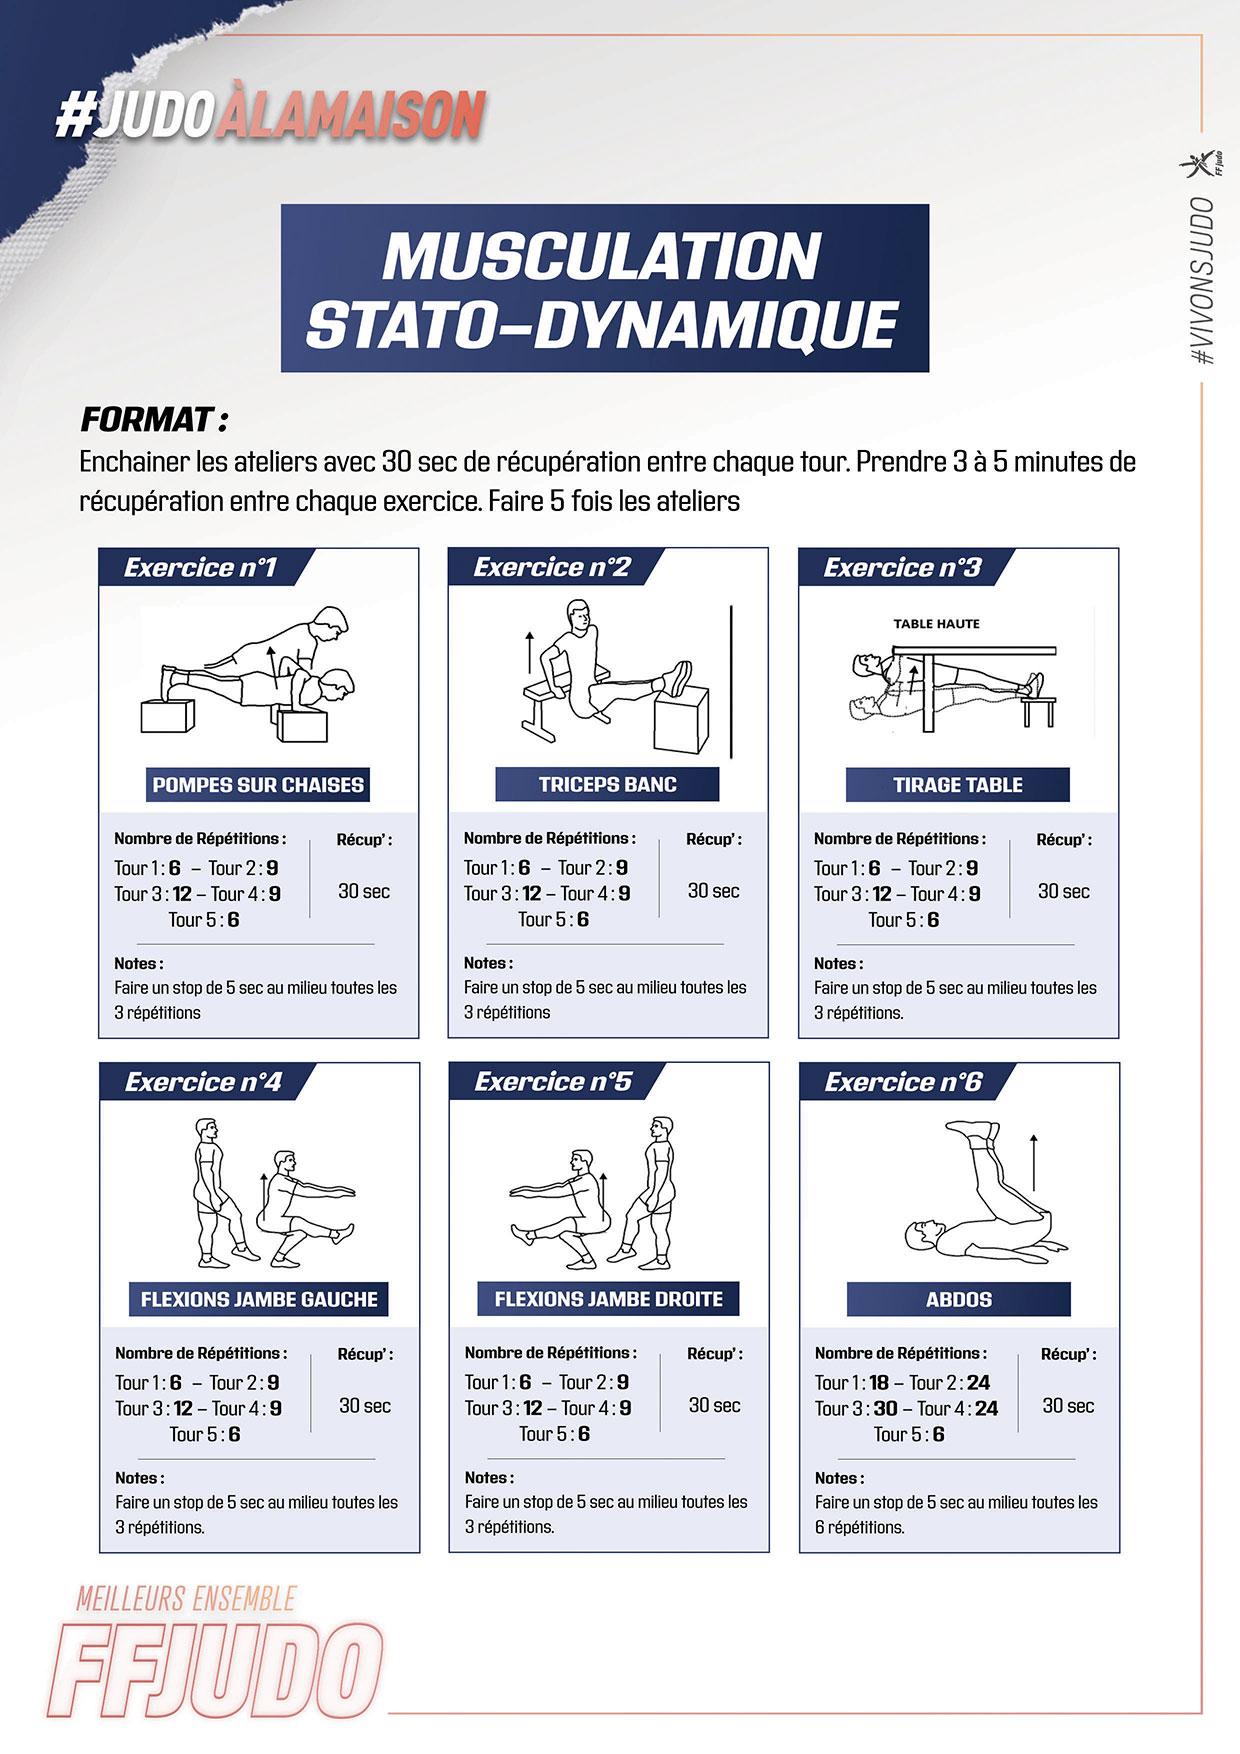 seance-muscu-stato-dynamique